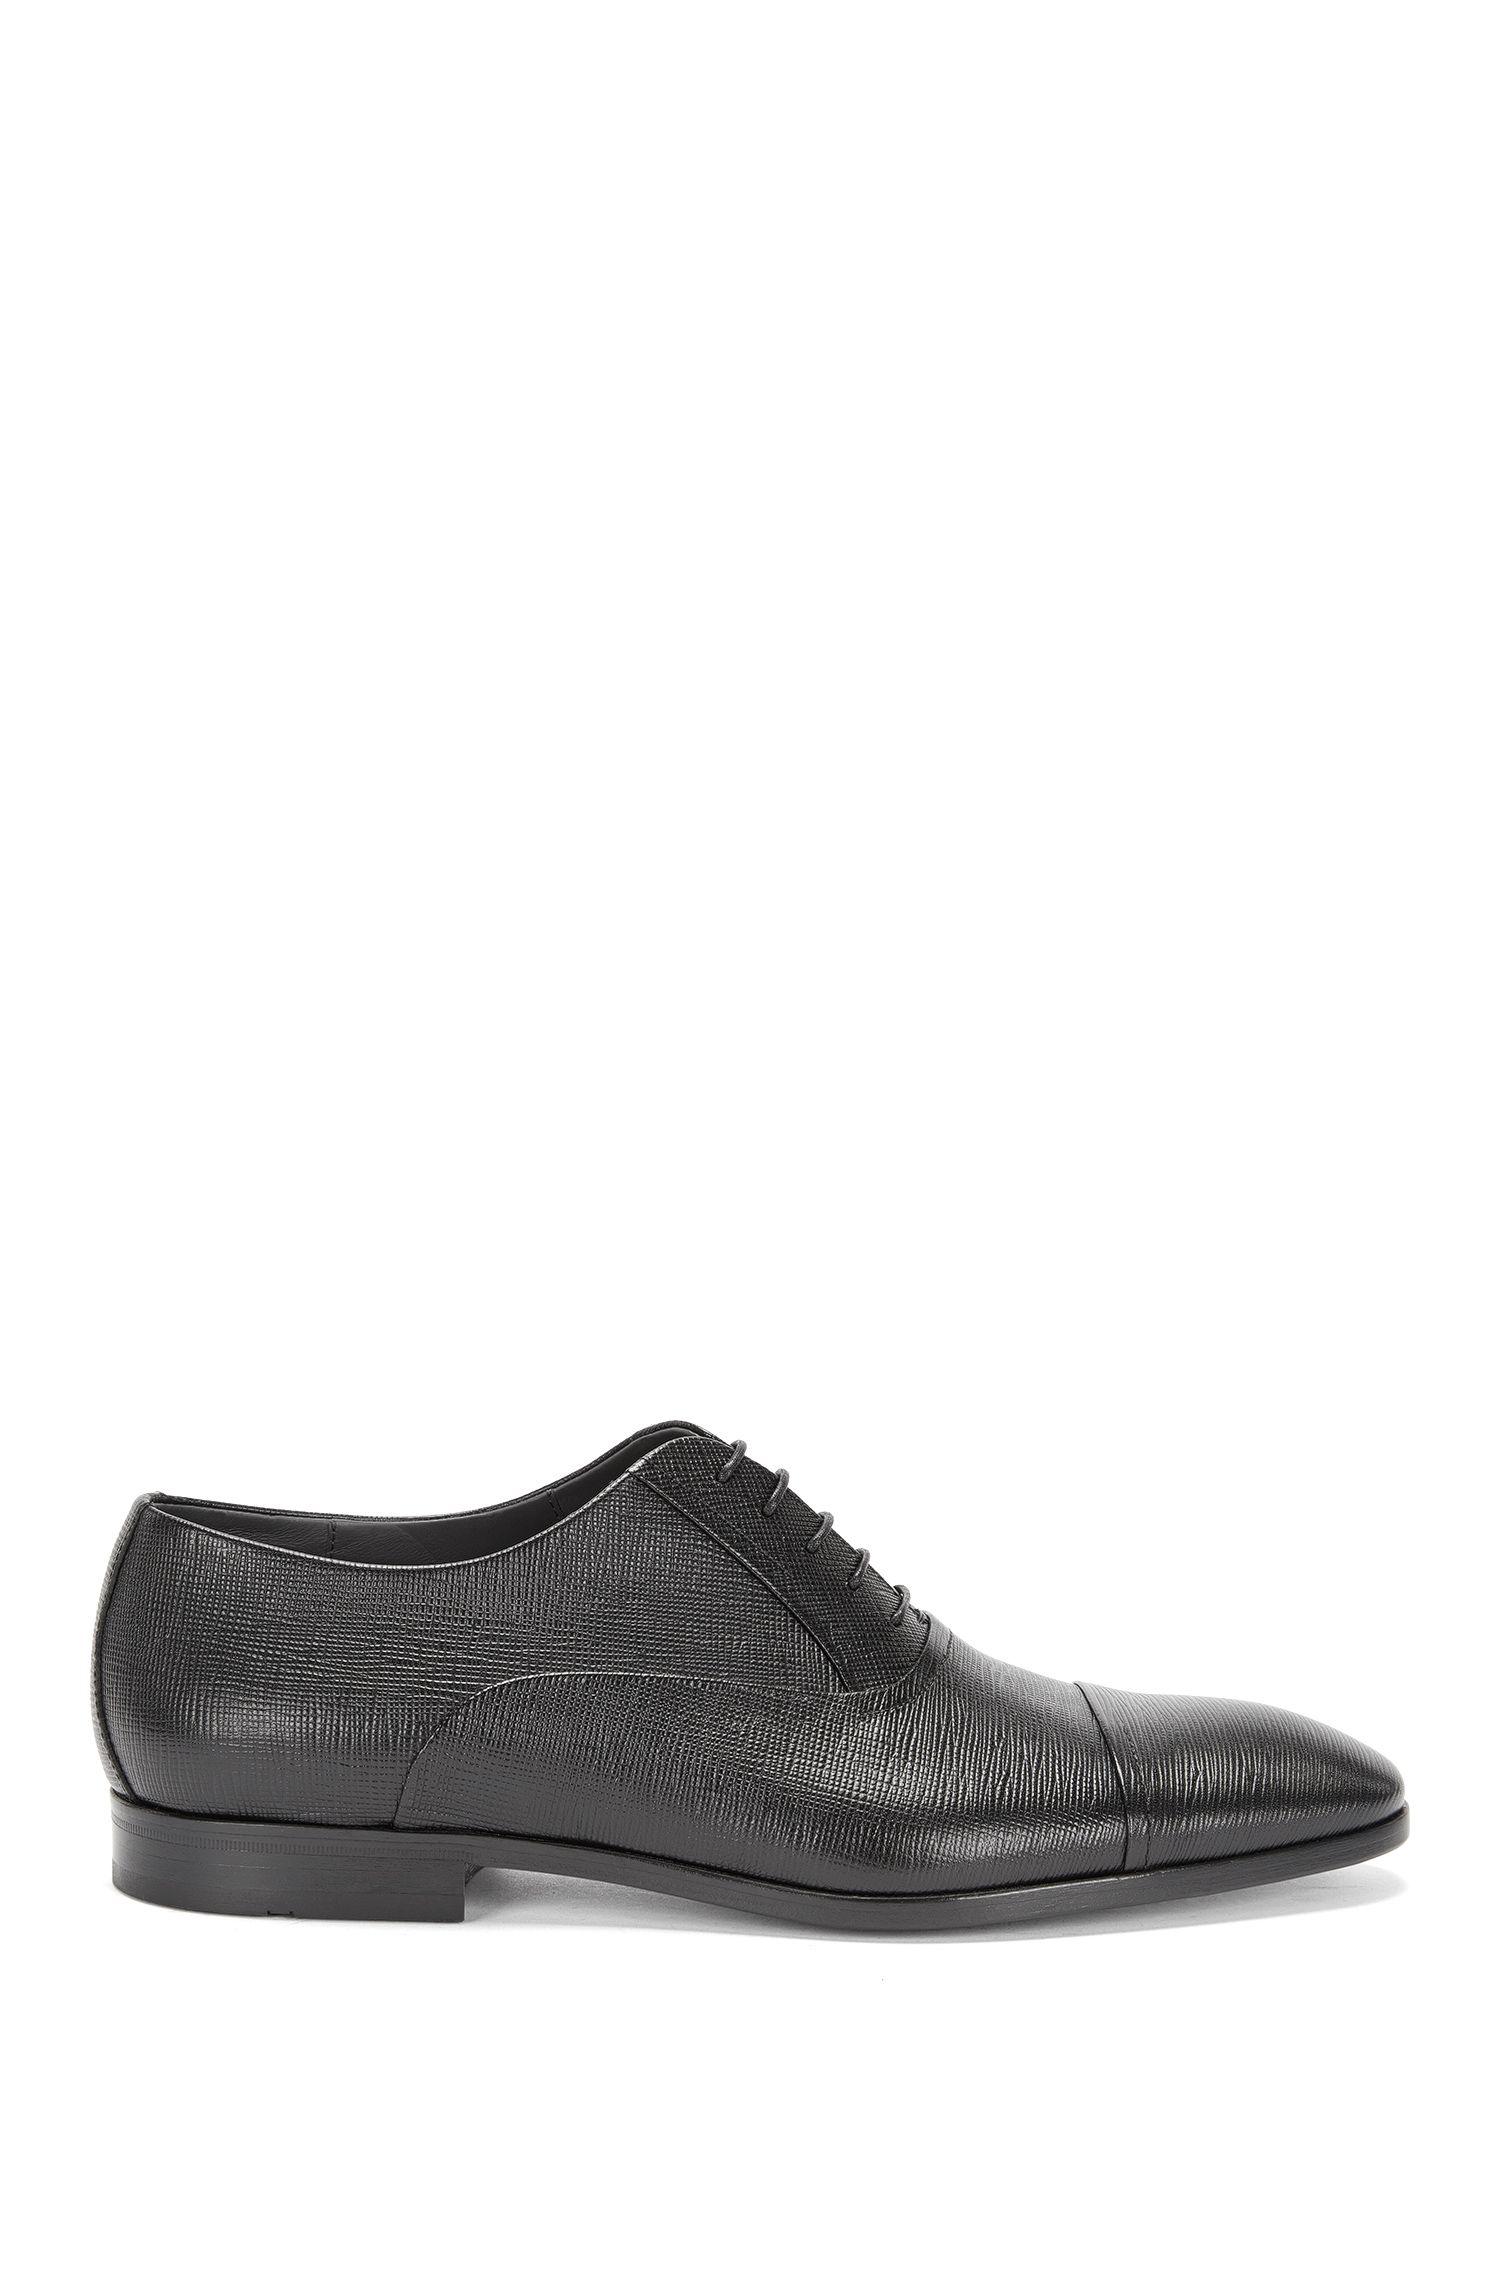 'Eveprin' | Italian Leather Oxford Dress Shoes